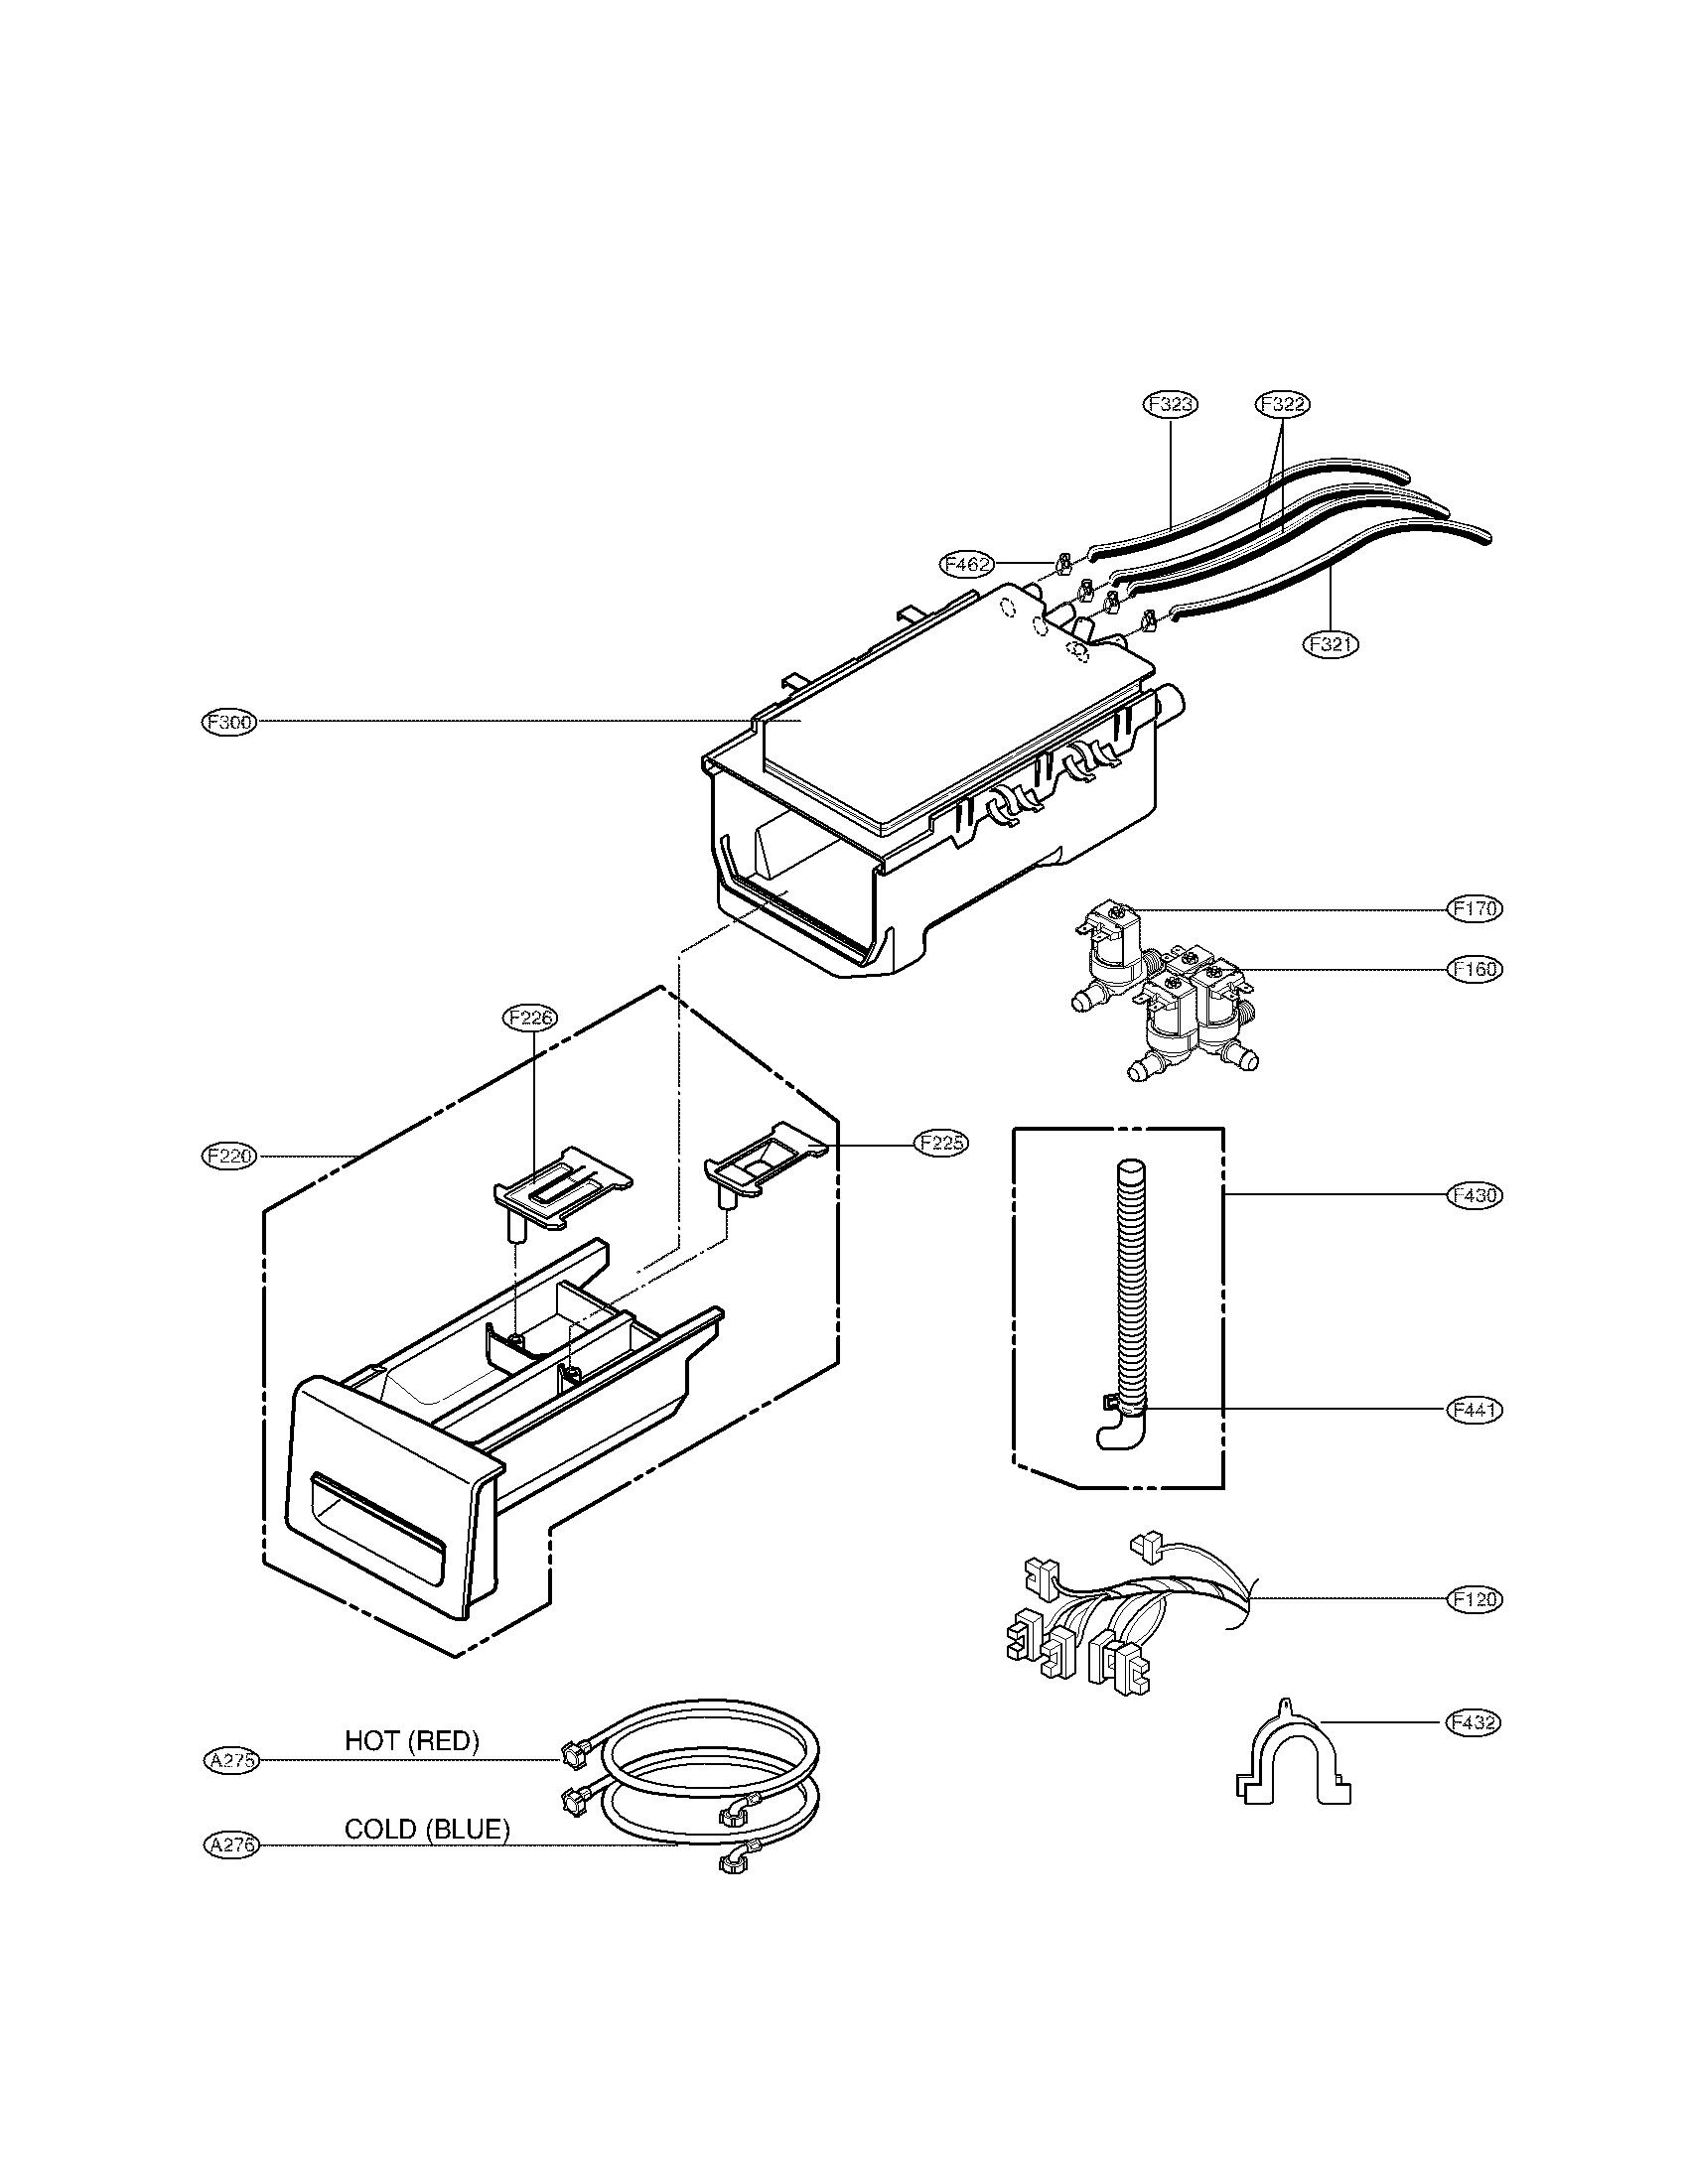 hight resolution of lg wm2010cw dispenser parts diagram